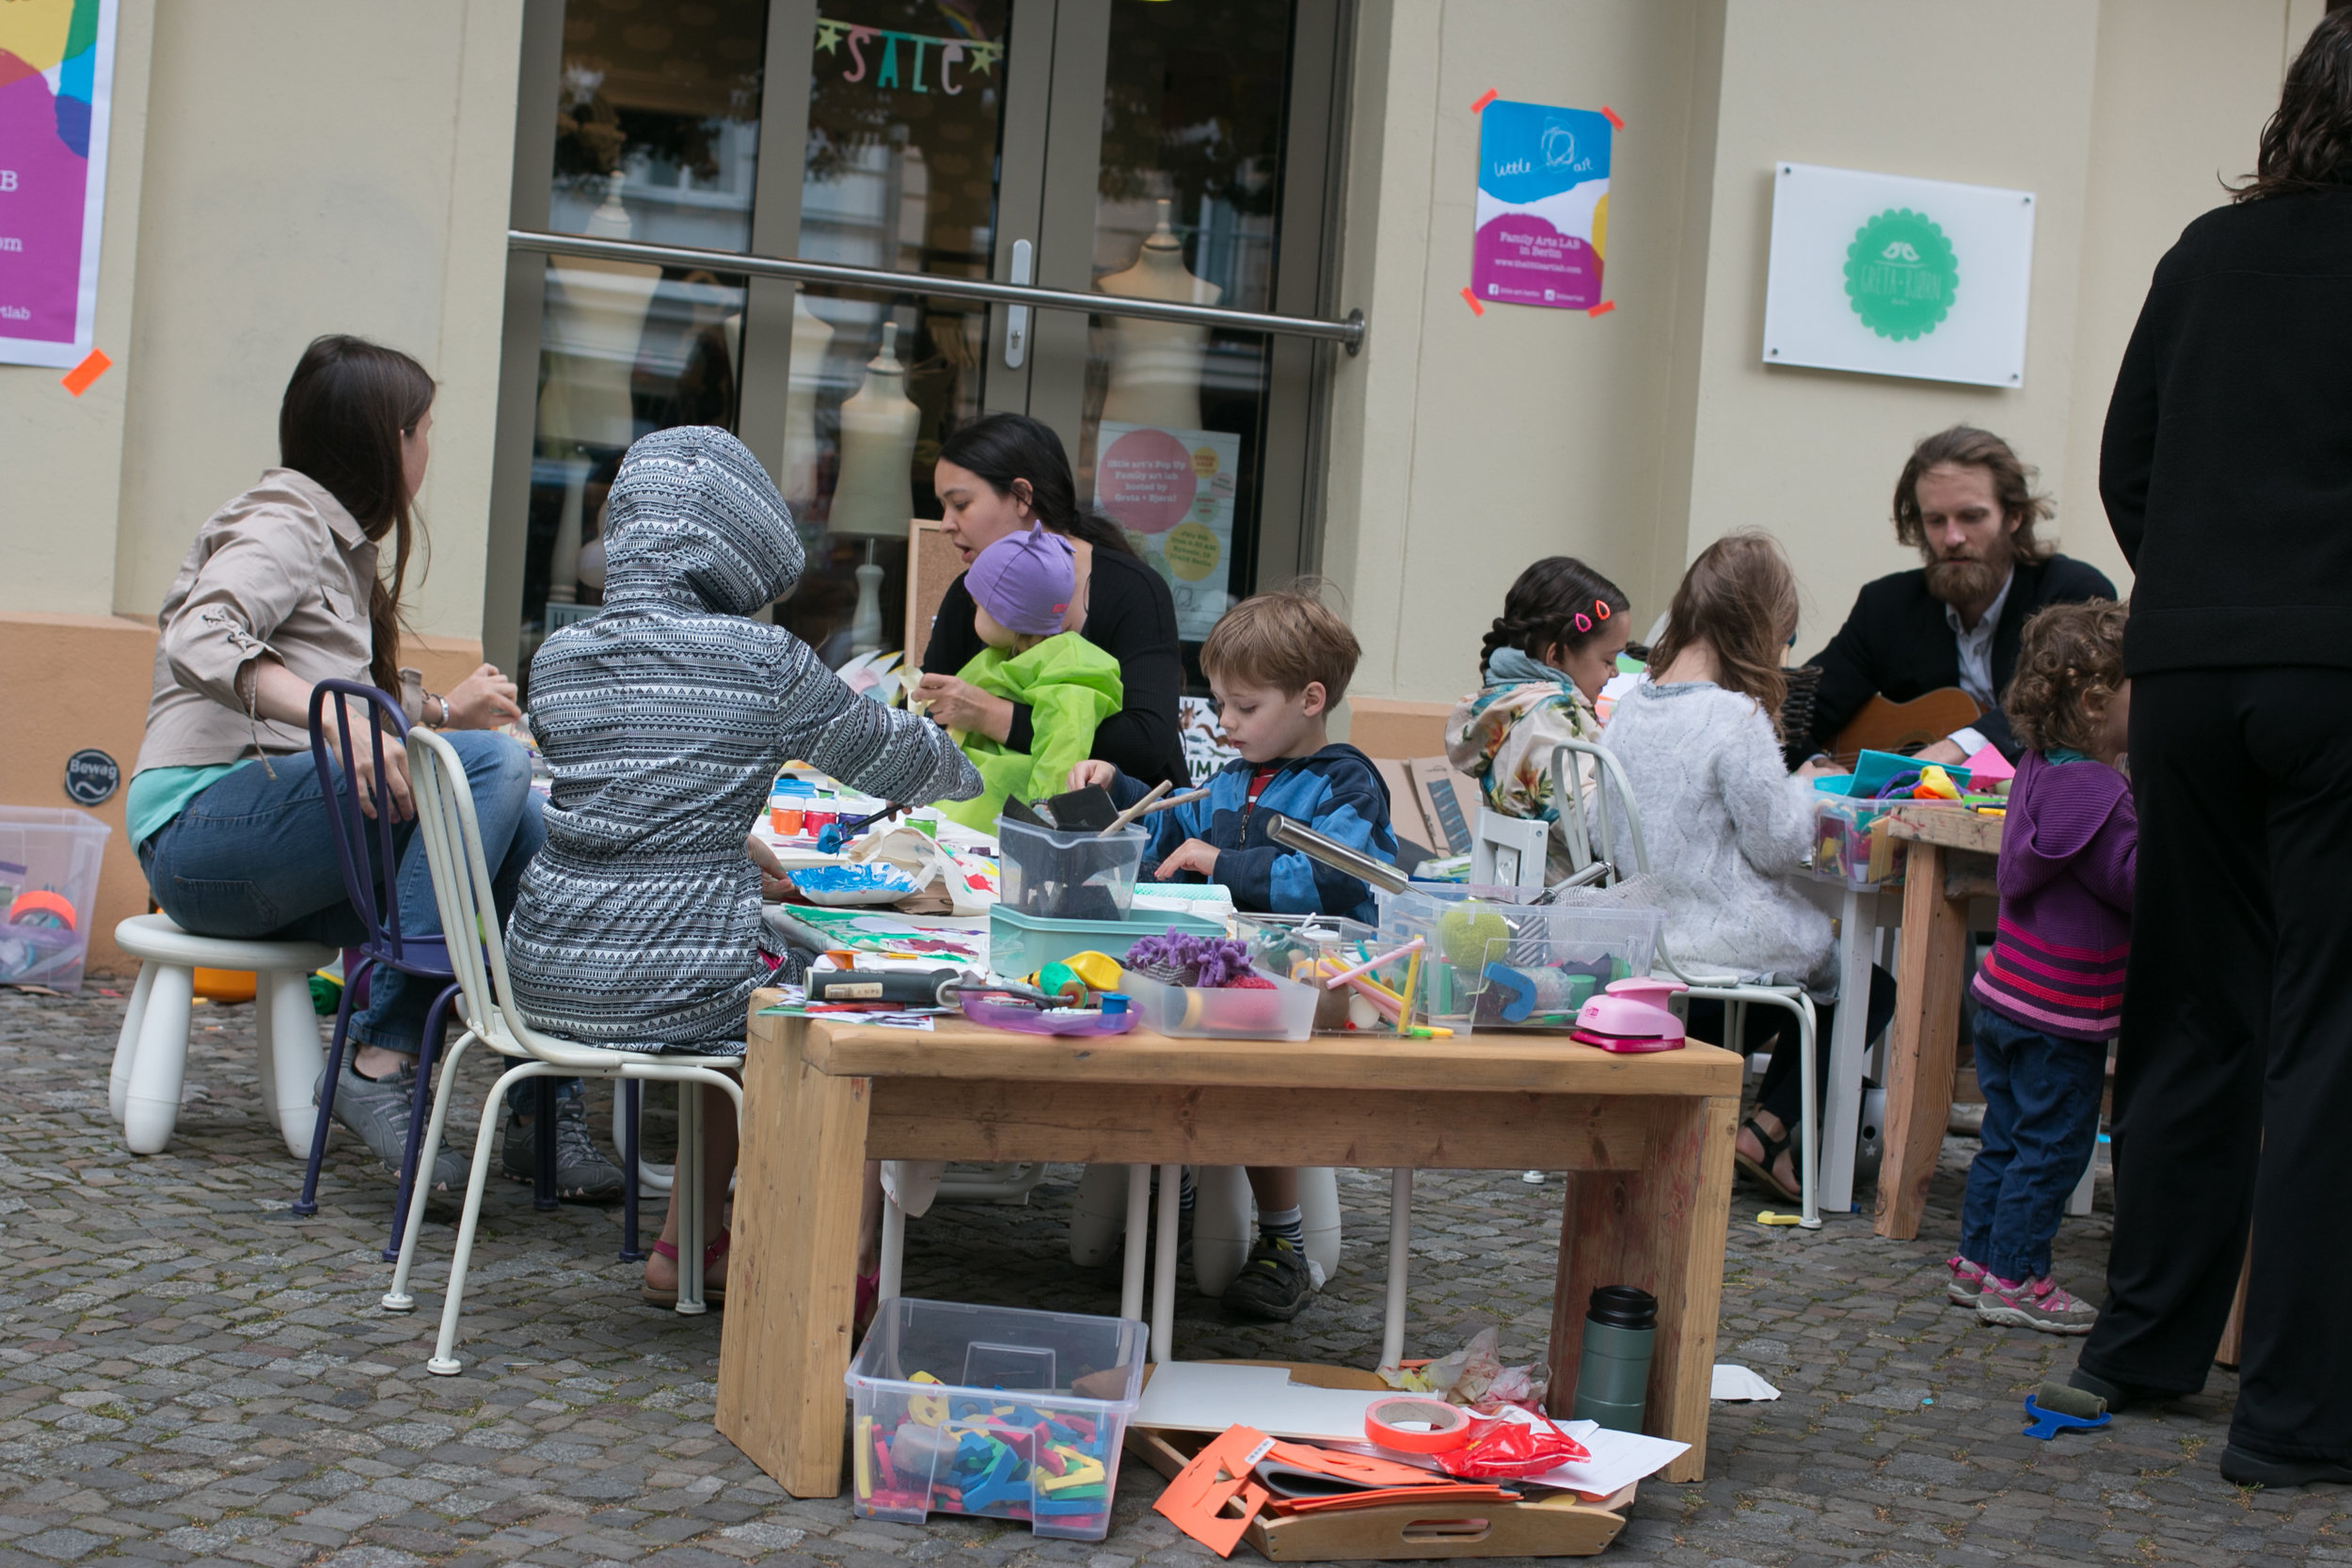 Pop Up Mobile Art Lab, little art, Berlin, Kids Art Workshop, Kinderkunstwerkstatt